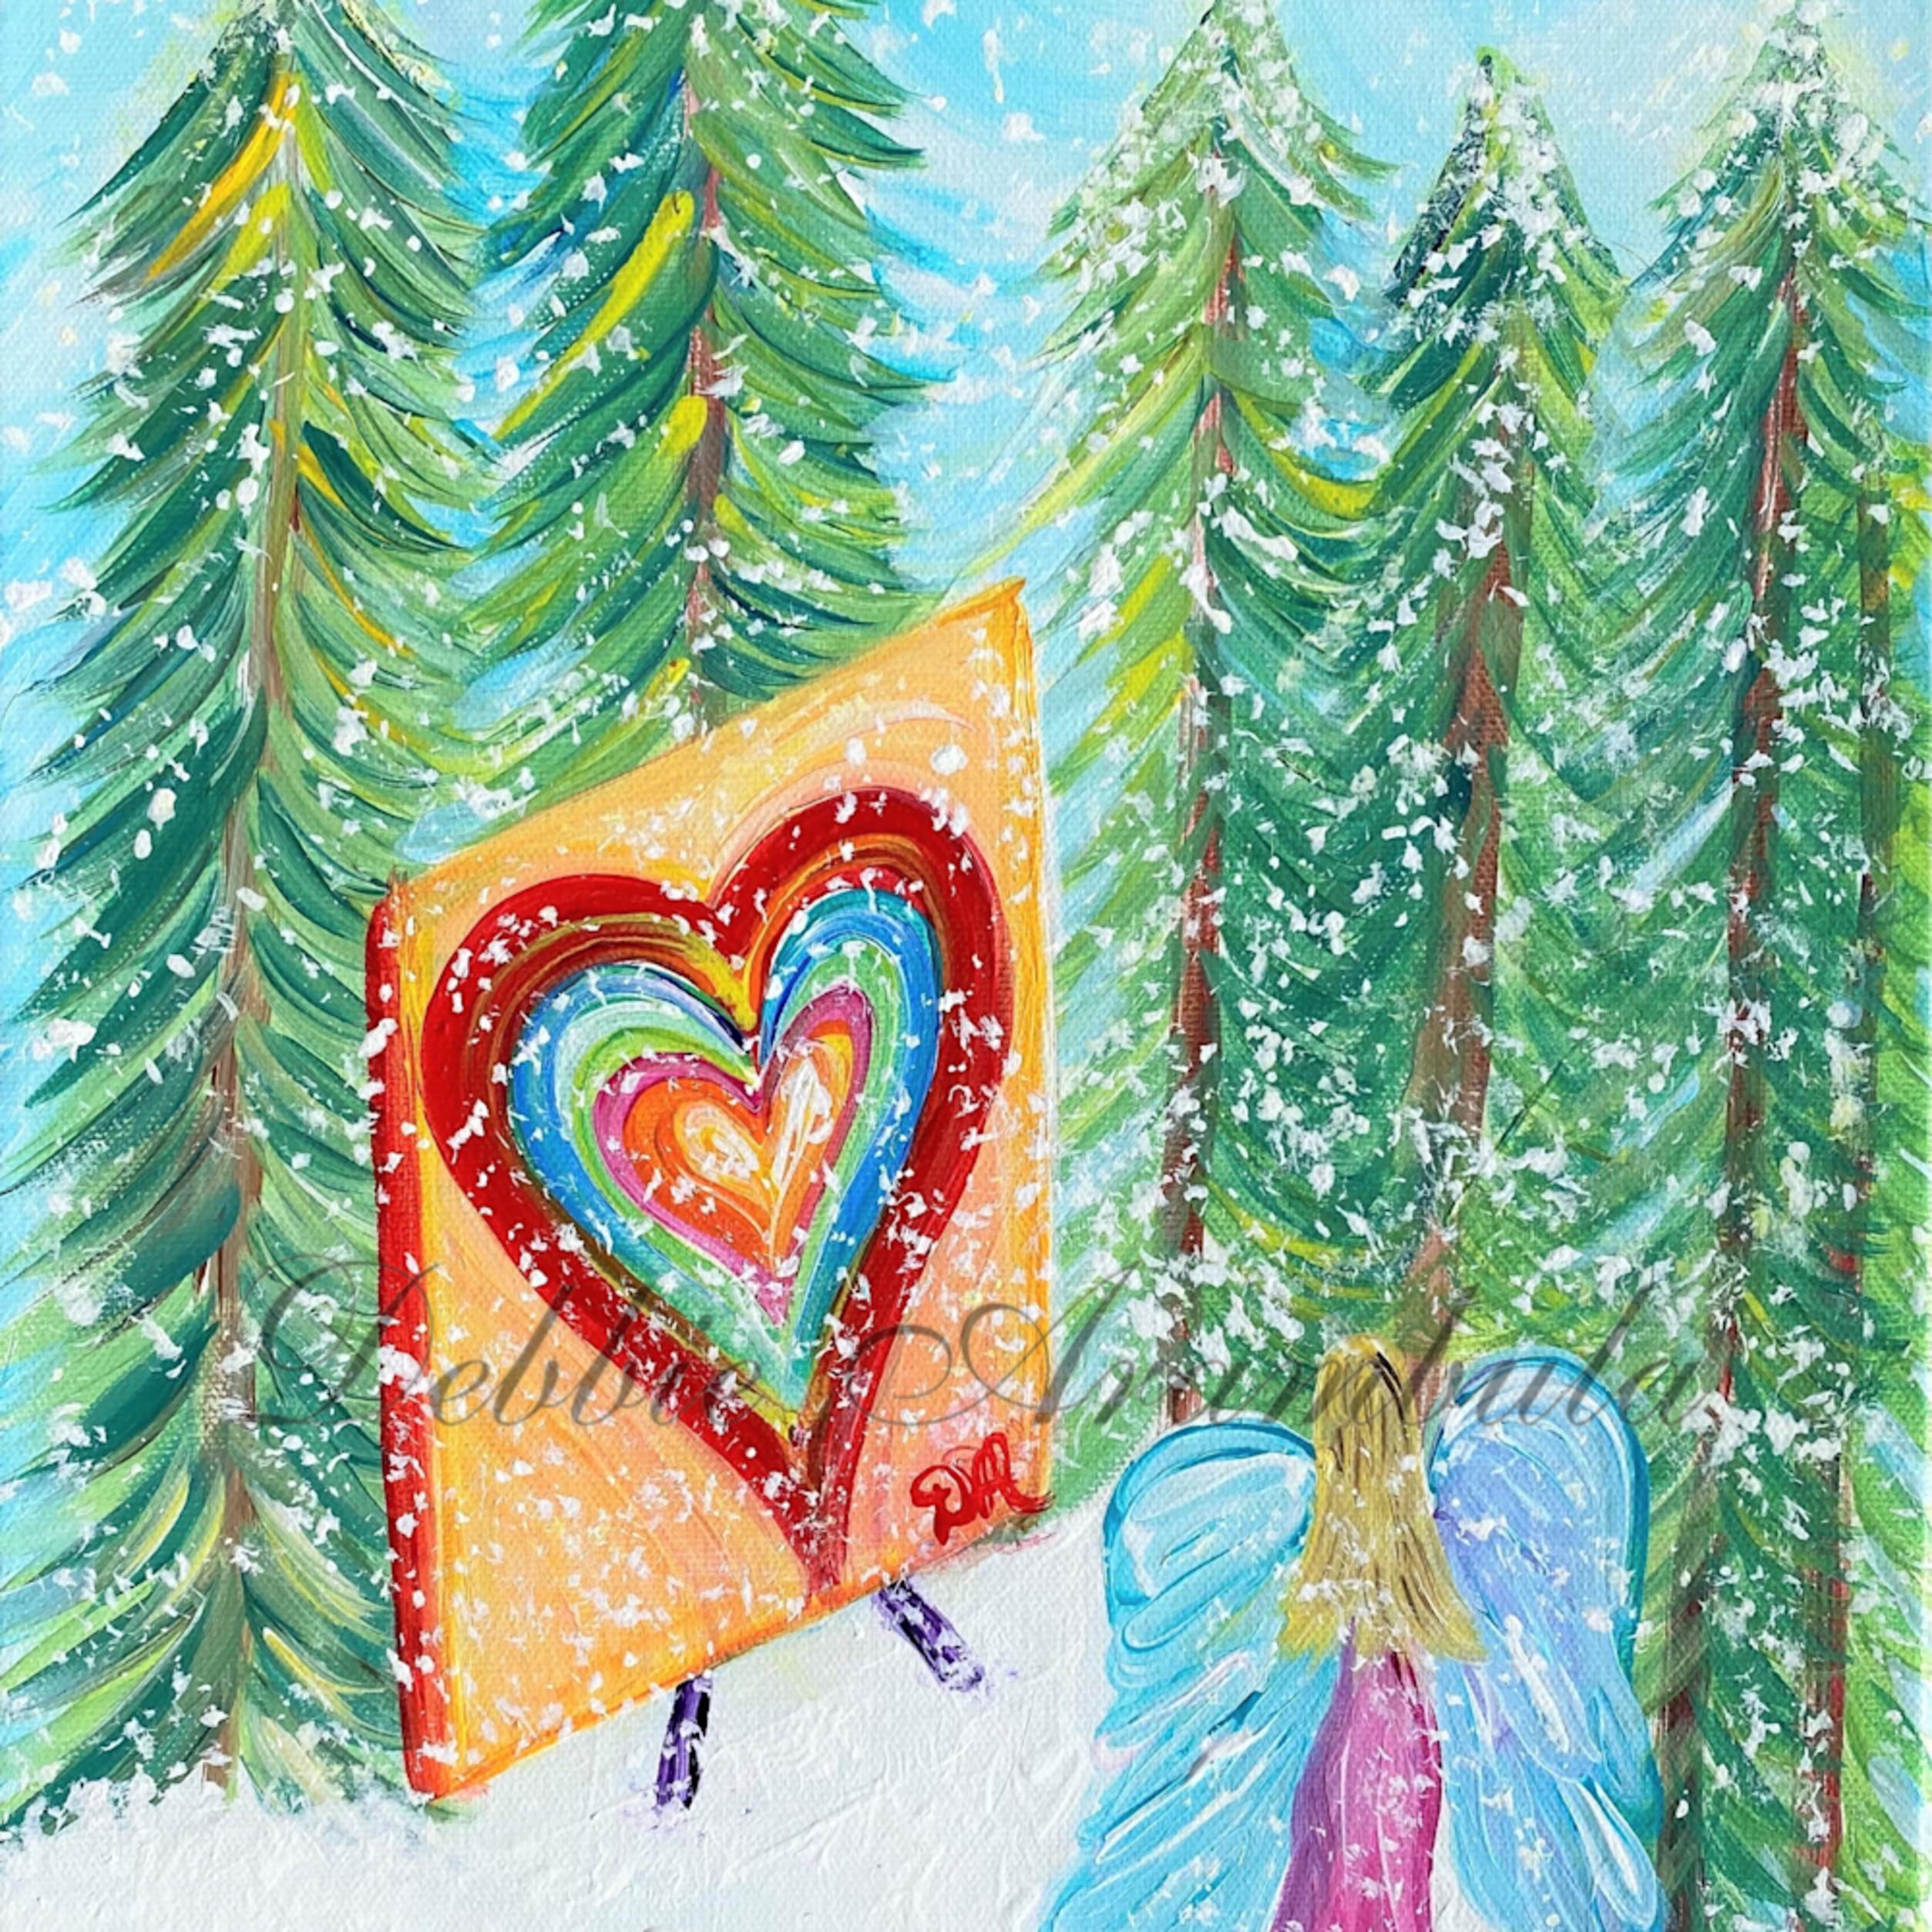 Goddes of love 2 rs7ze6